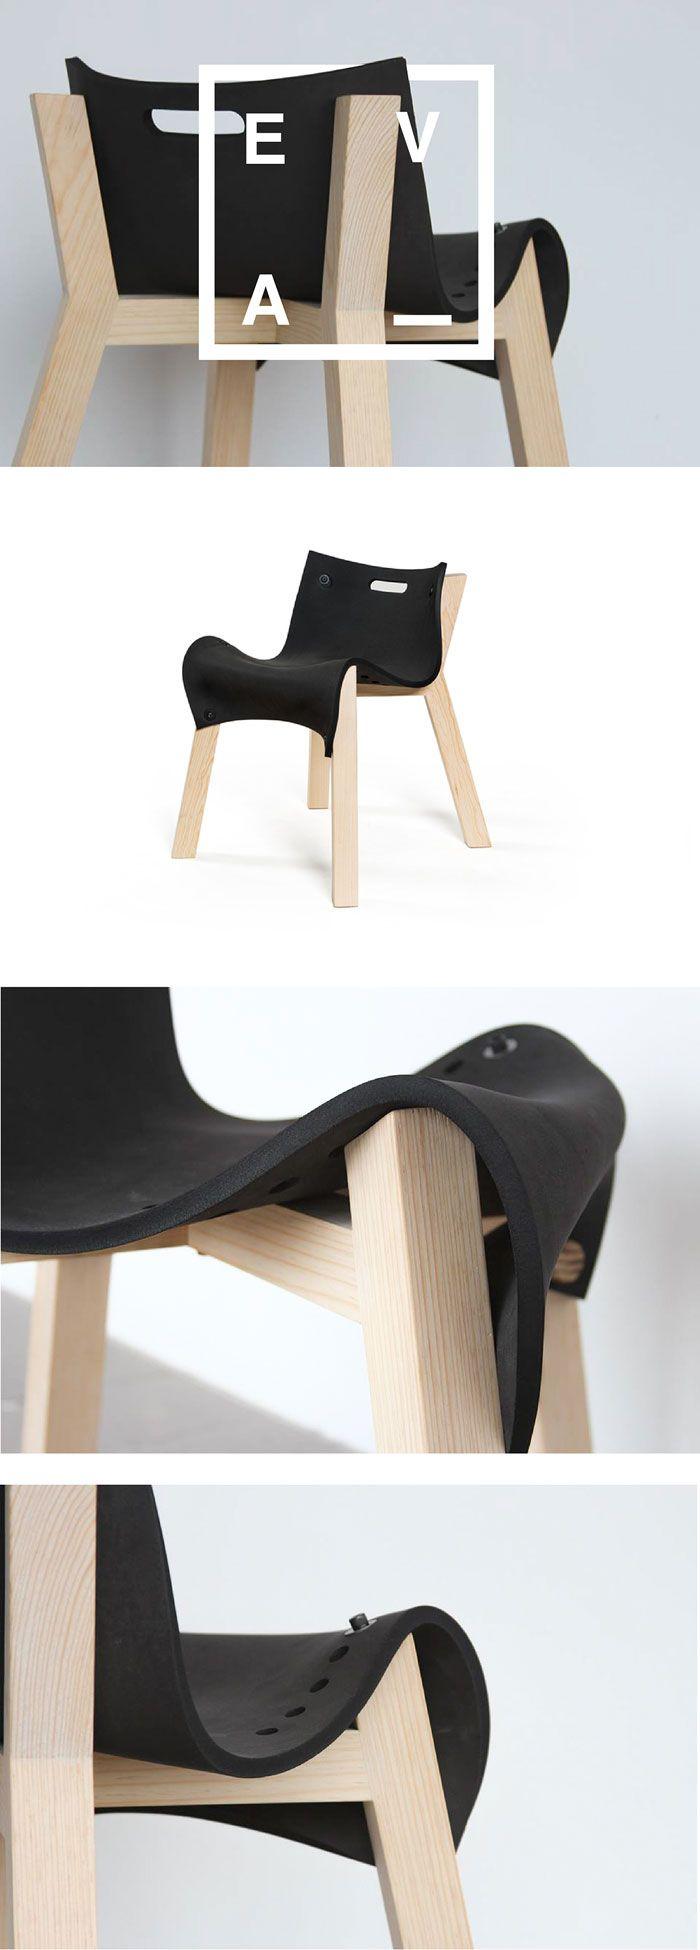 la eva chair design by david ortiz furniture